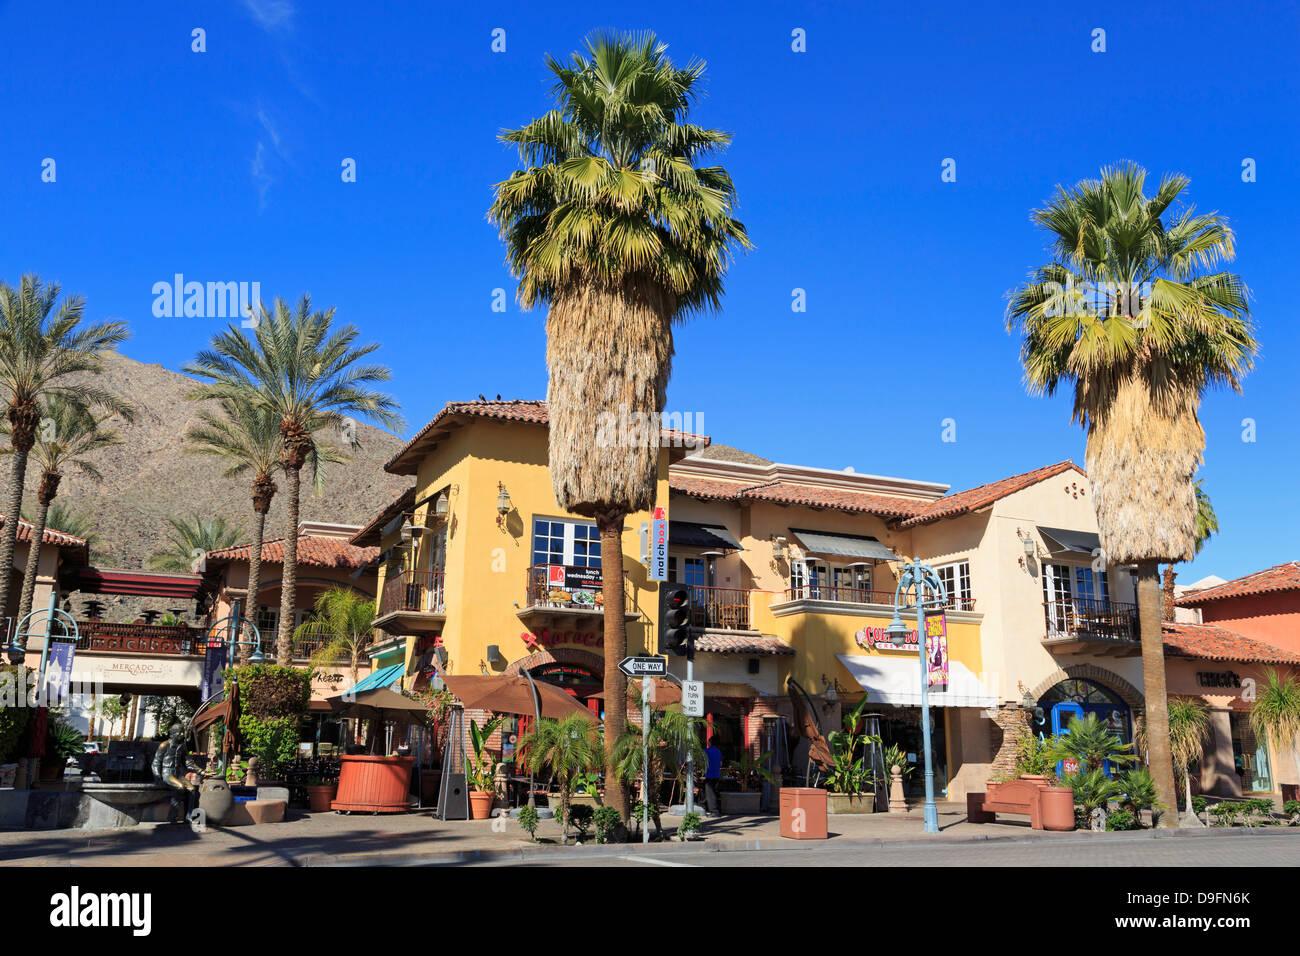 Mercado Plaza on Palm Canyon Drive, Palm Springs, California, USA - Stock Image